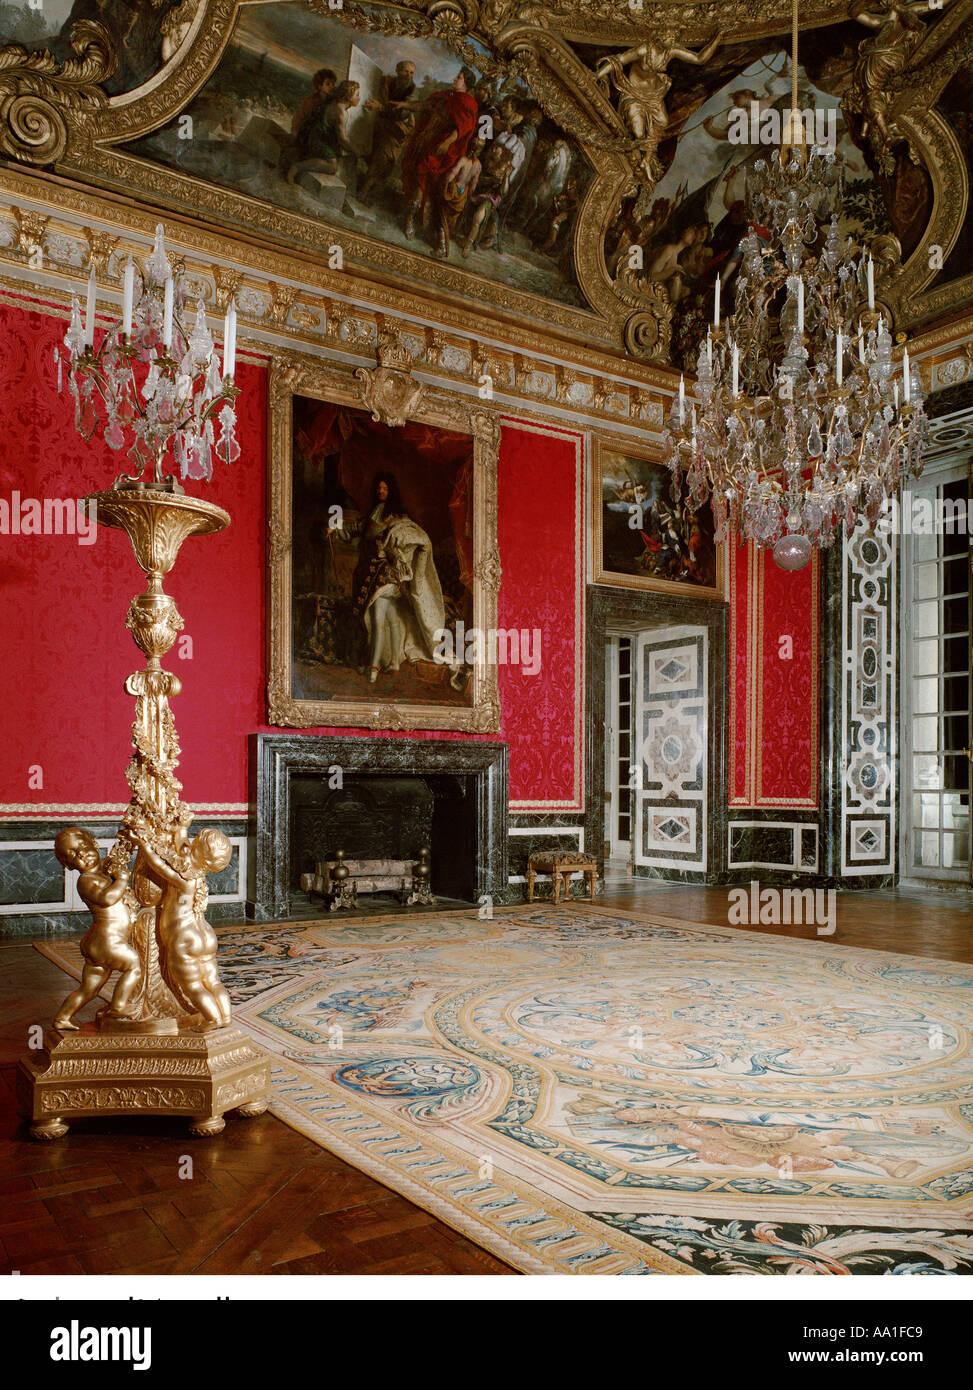 Palace of versailles salon d apollon stock photo royalty for Salon versailles